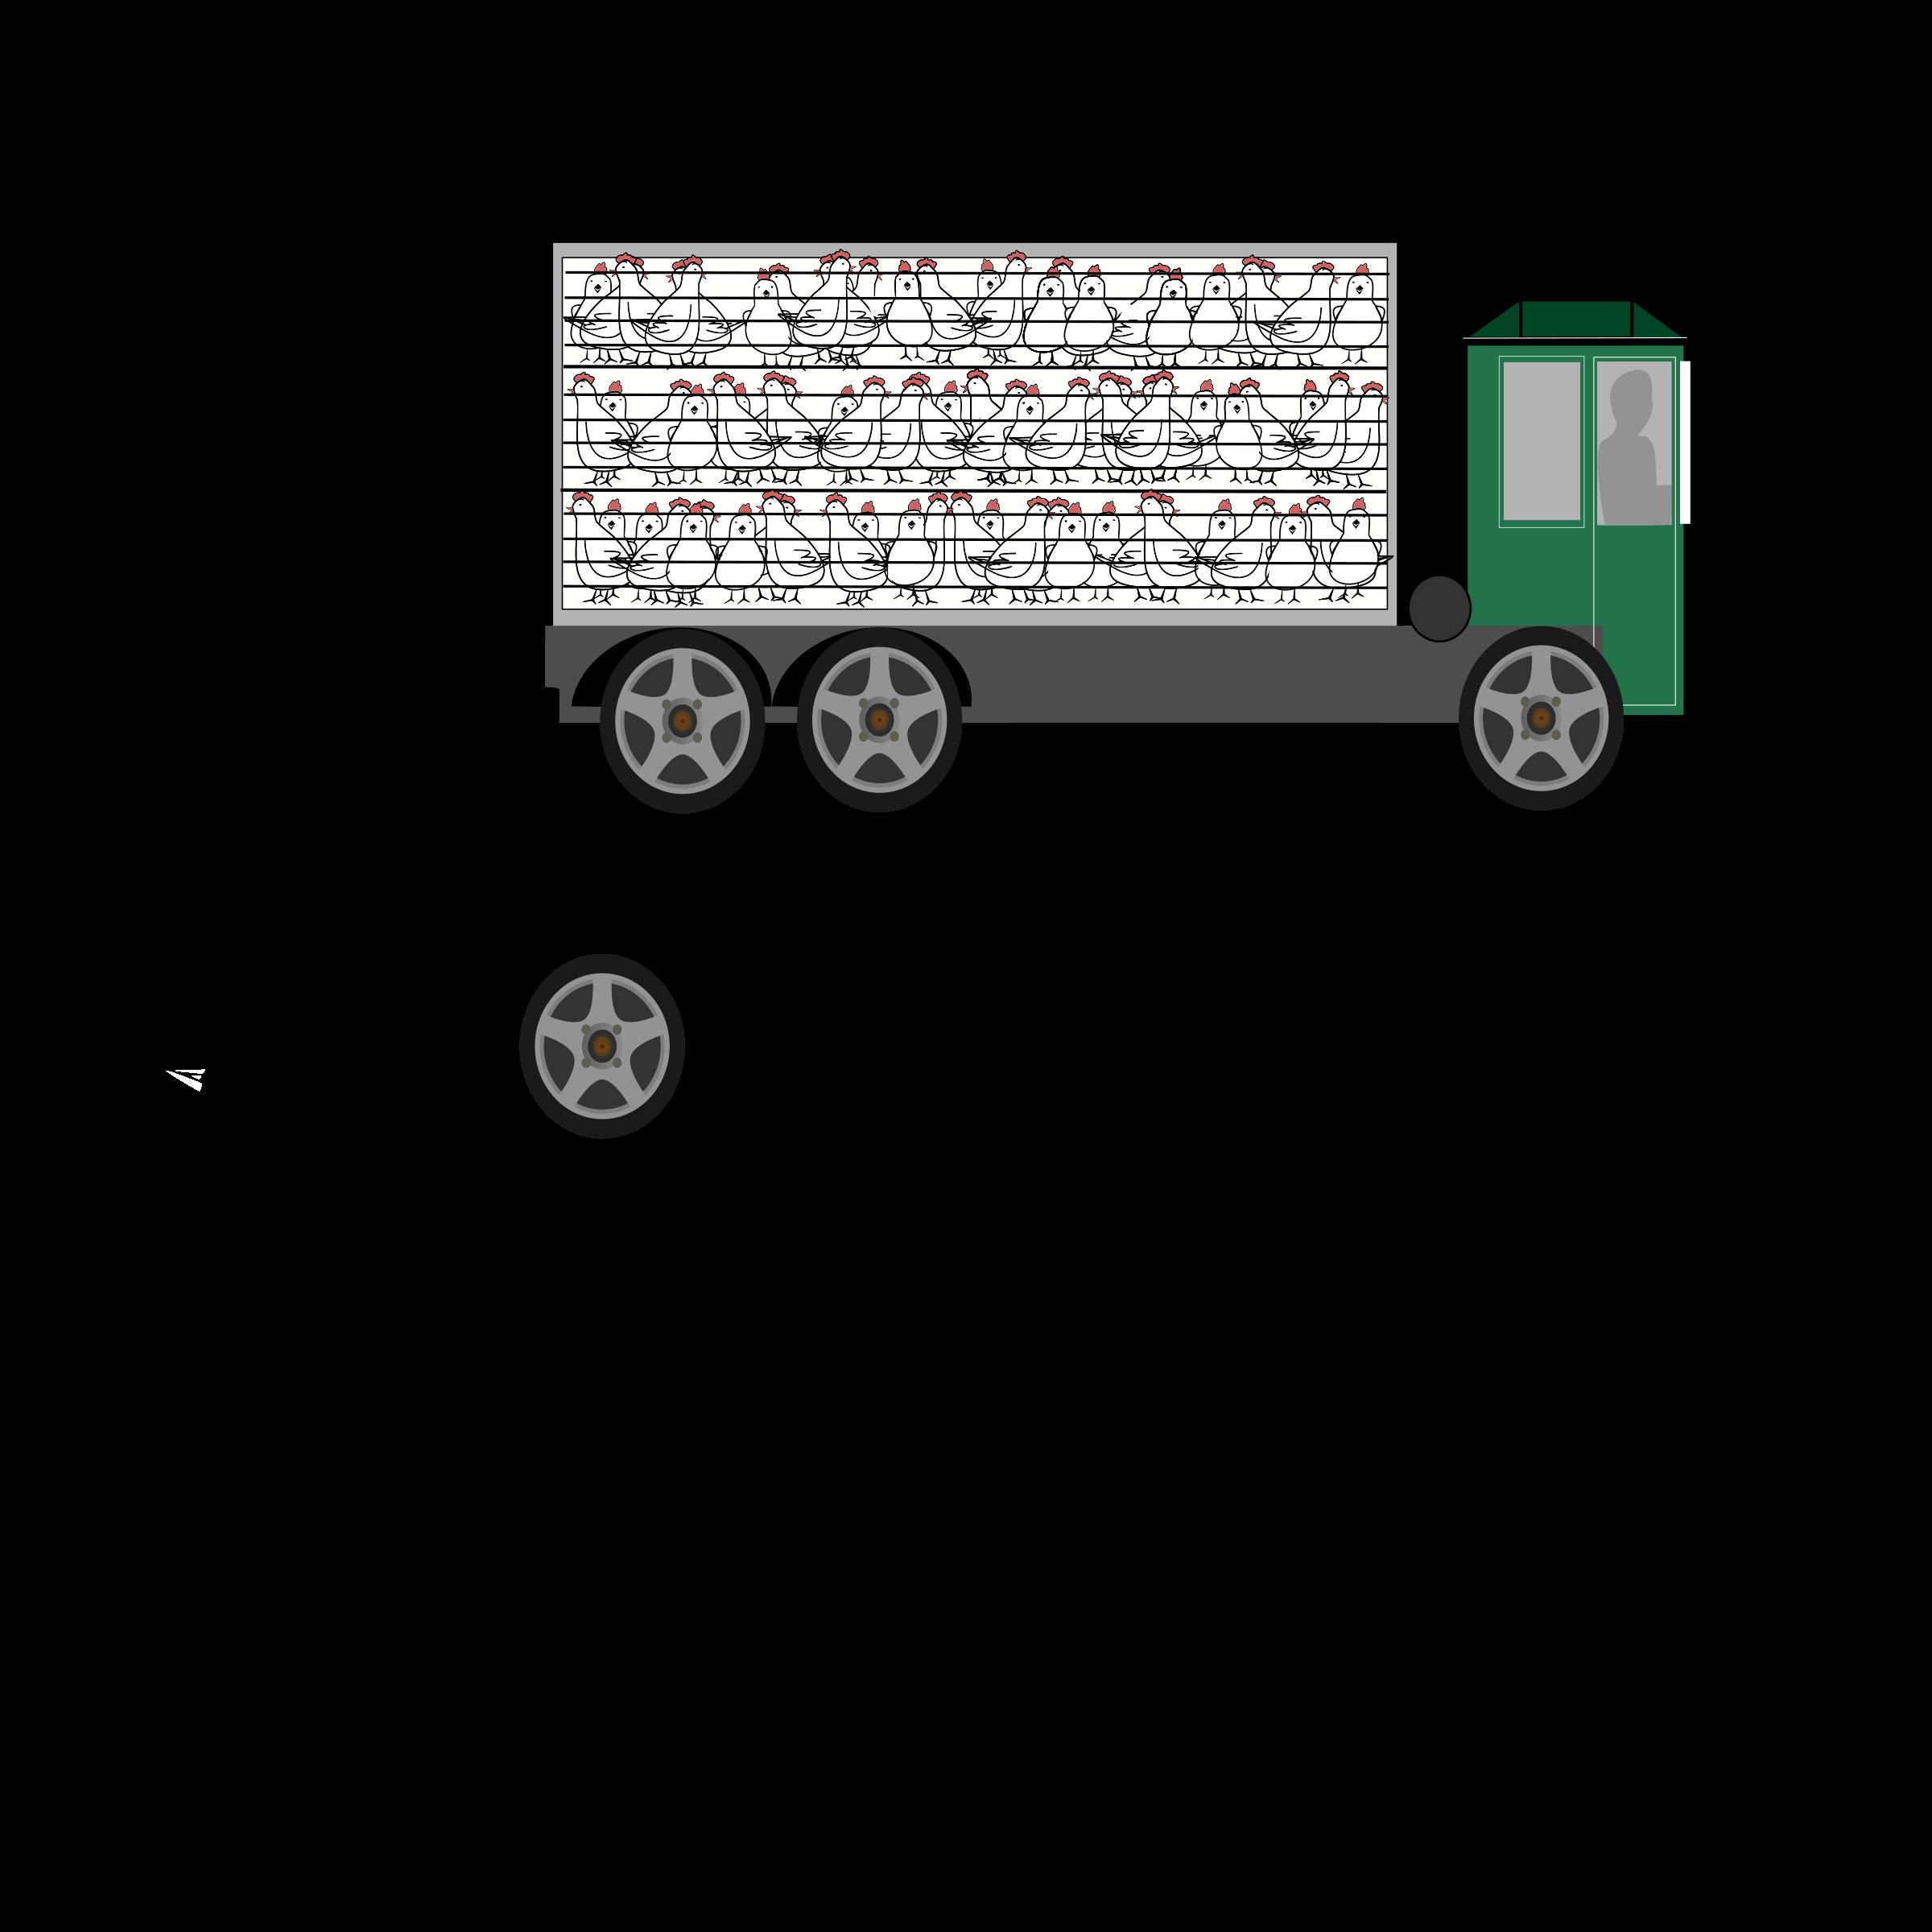 Truck clipart transport truck Truck animal Truck animal transport